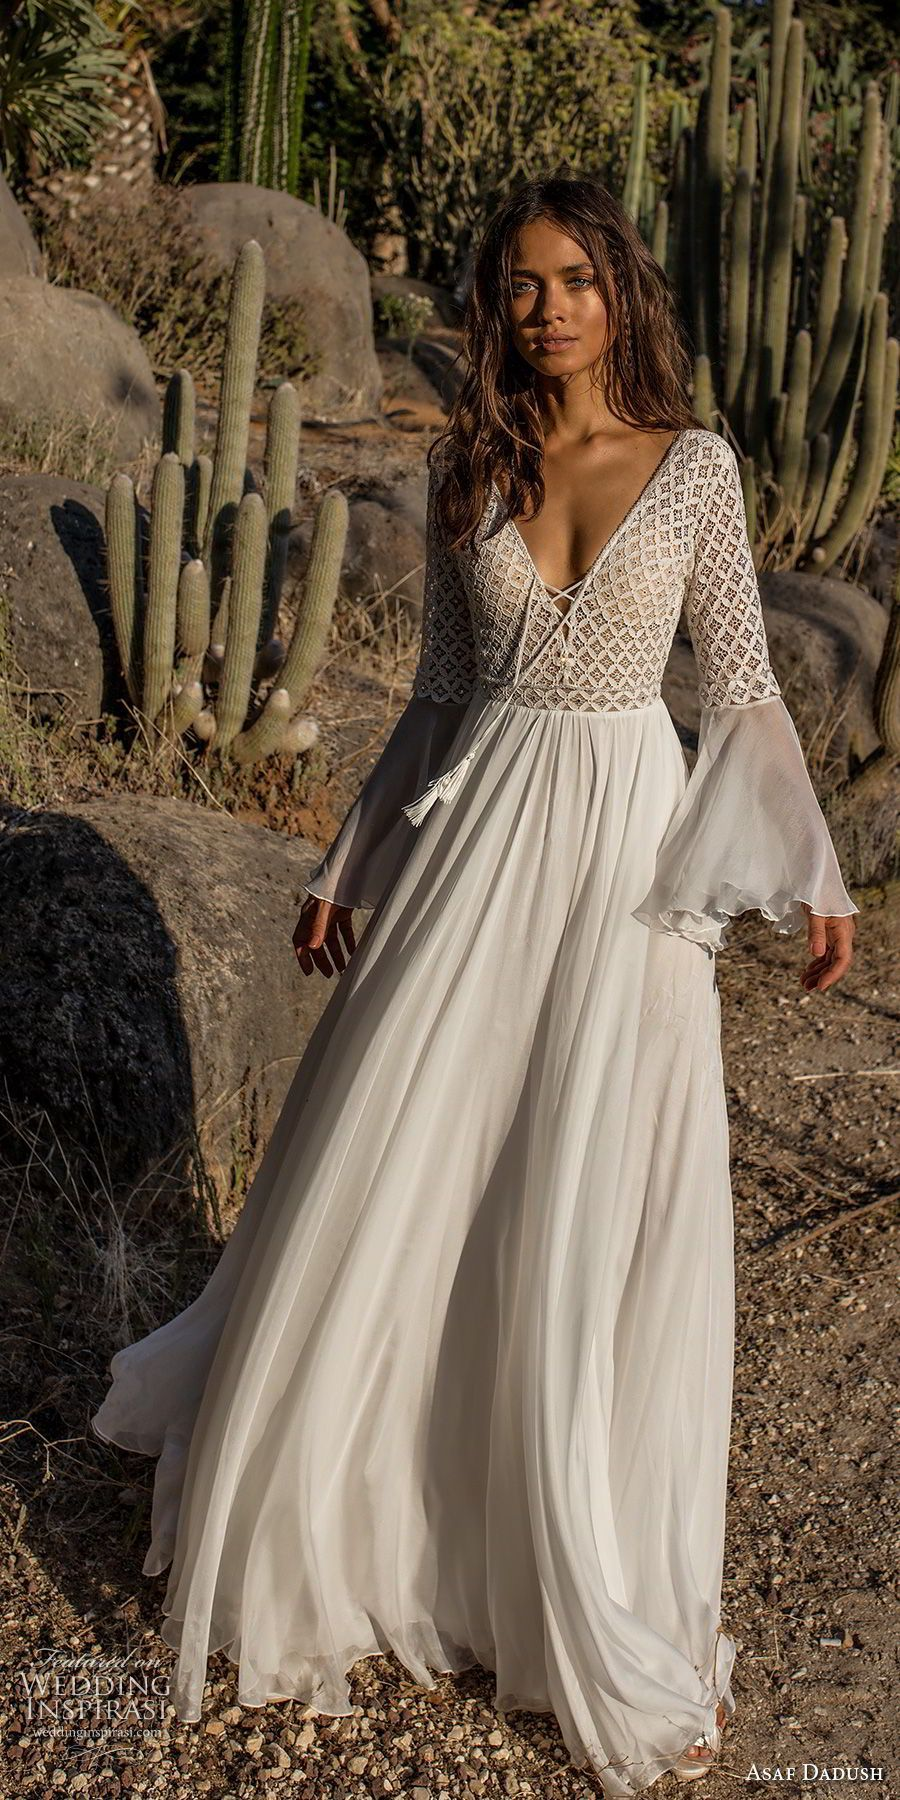 Asaf dadush bridal long lantern sleeves deep v neckline heavily